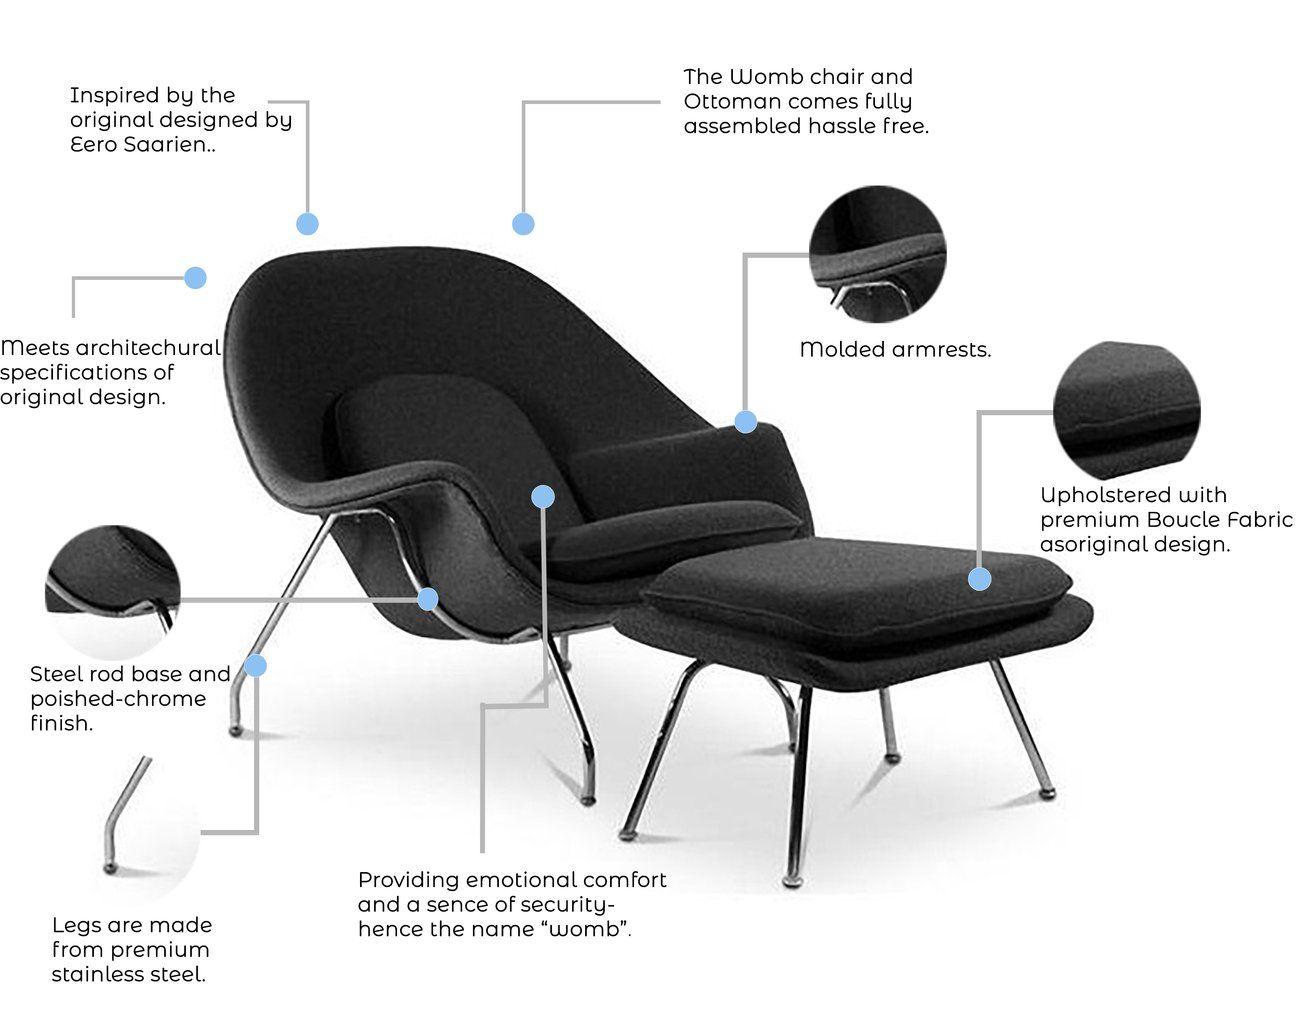 Eero Saarinen Womb Chair and Ottoman Black - modholic.com  Womb